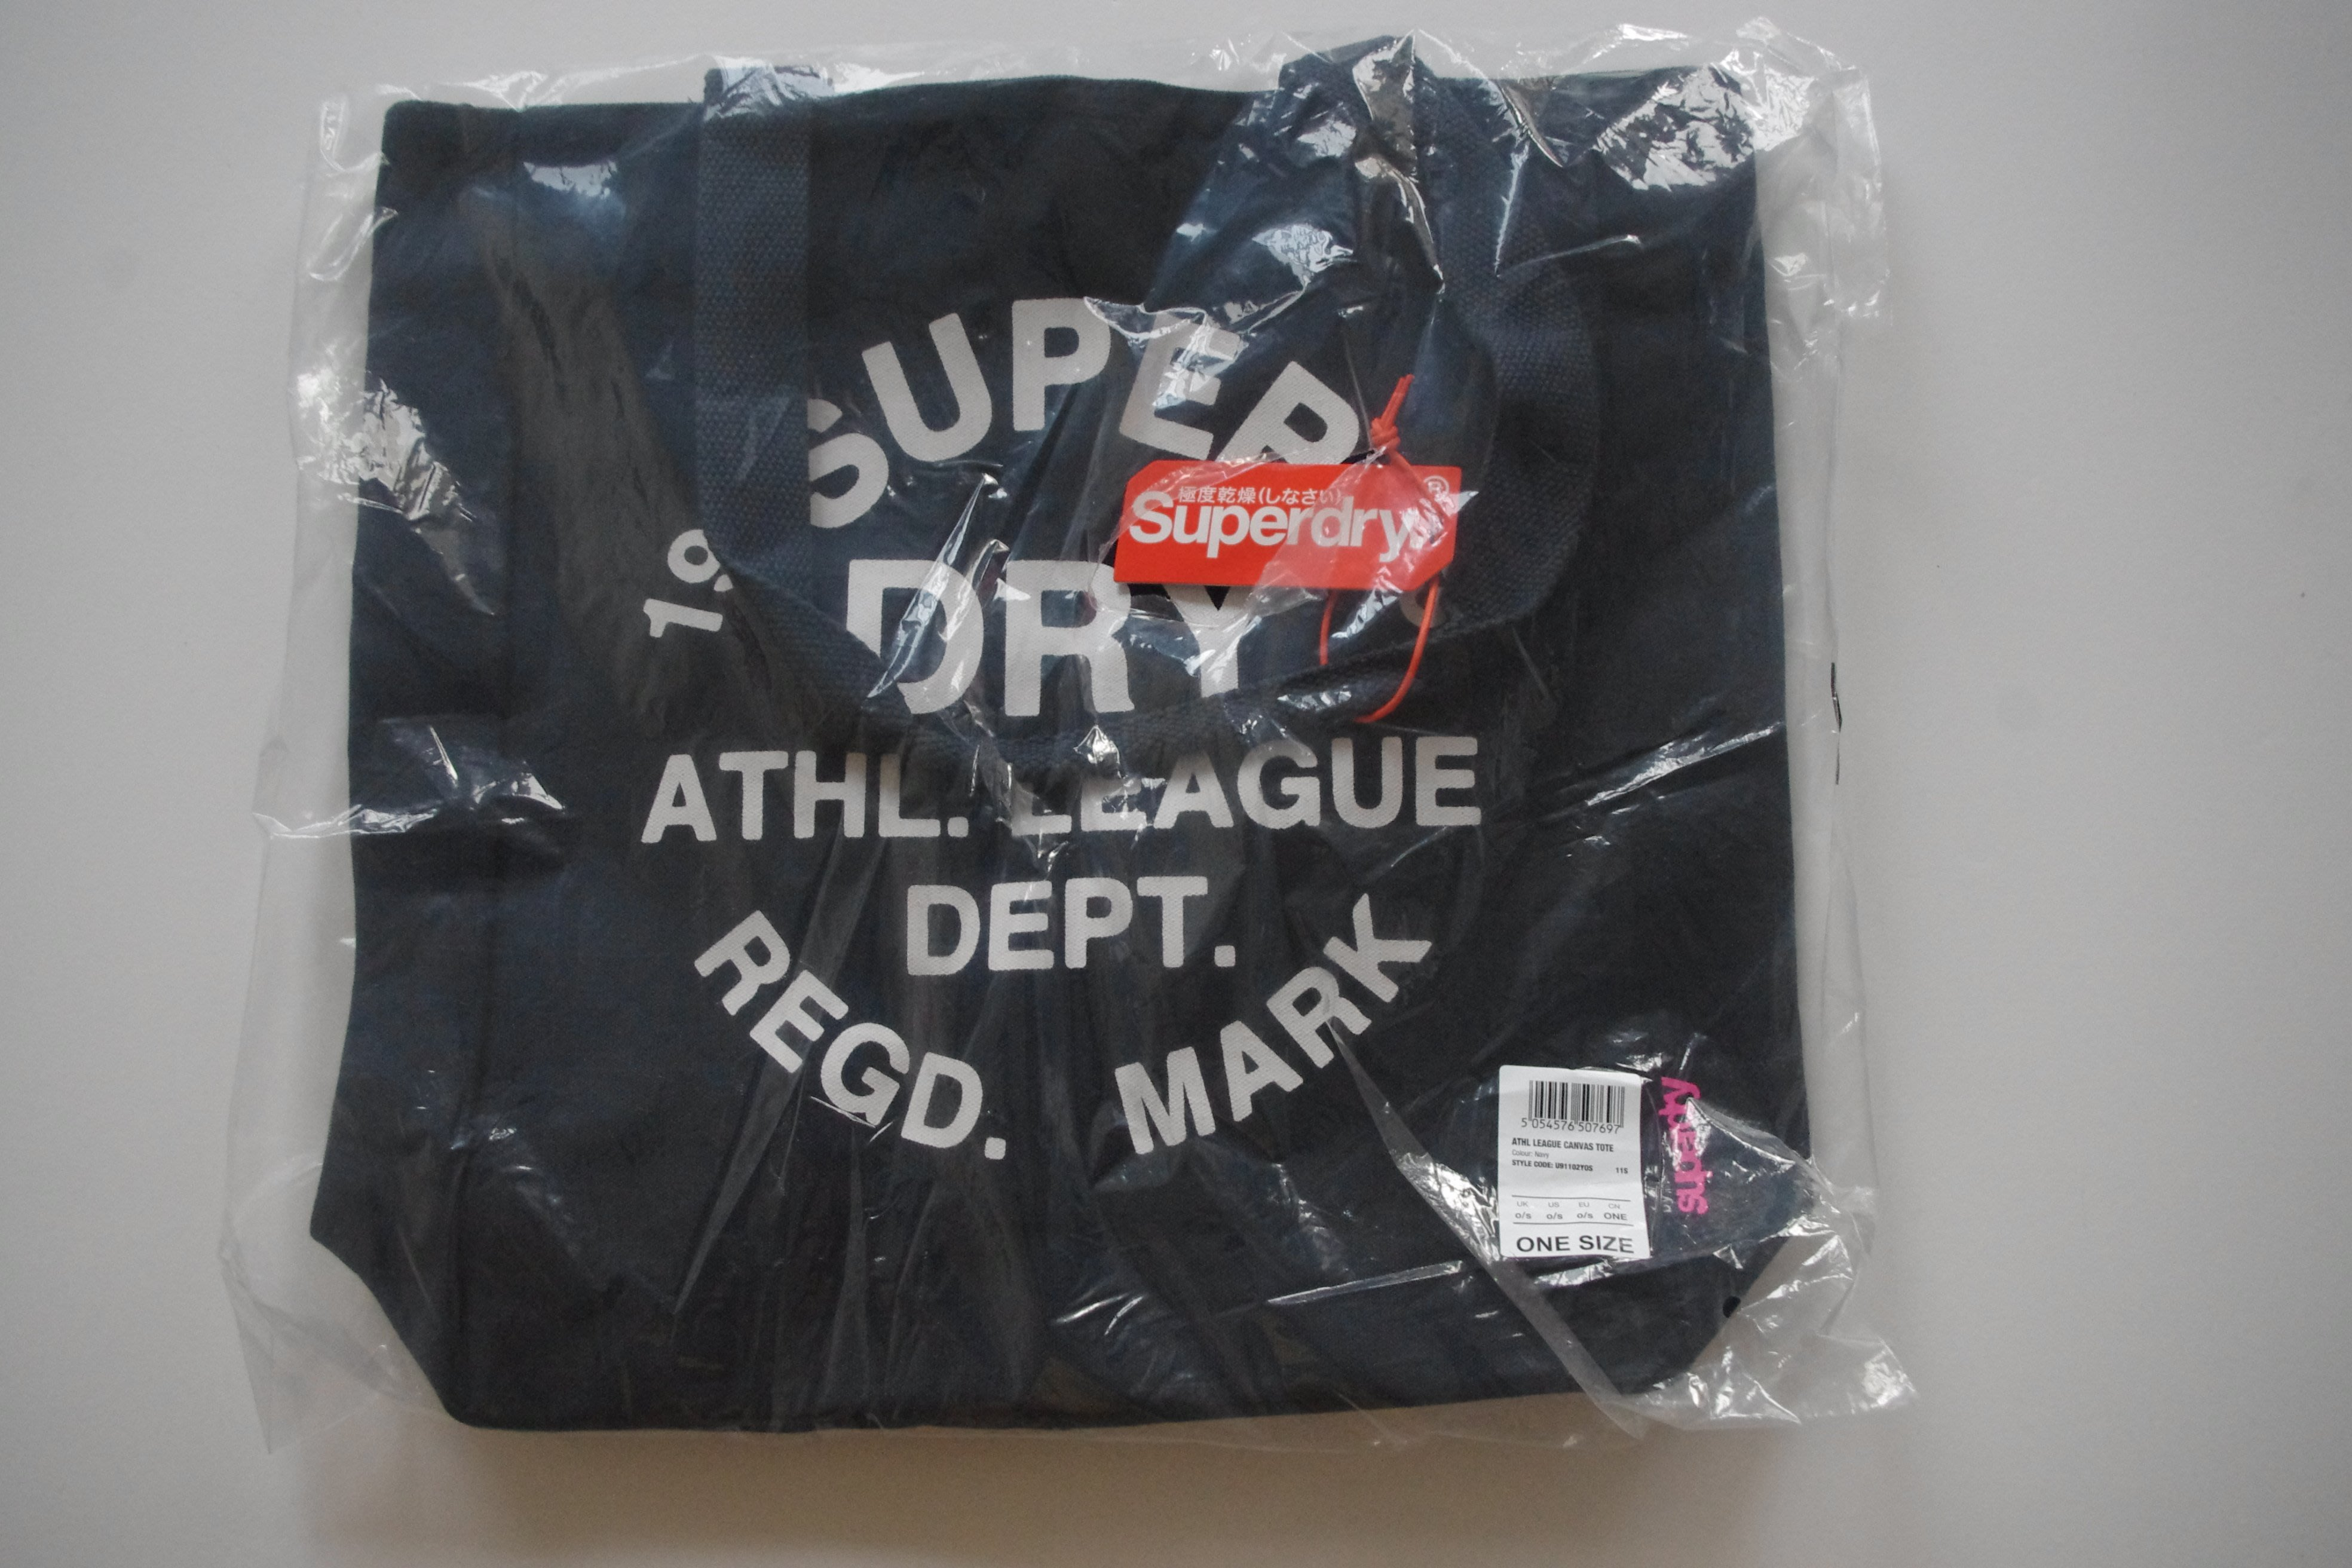 Superdry 極度乾燥 Athletic League 女生 印花圖案 帆布托特包 A&F Hollister